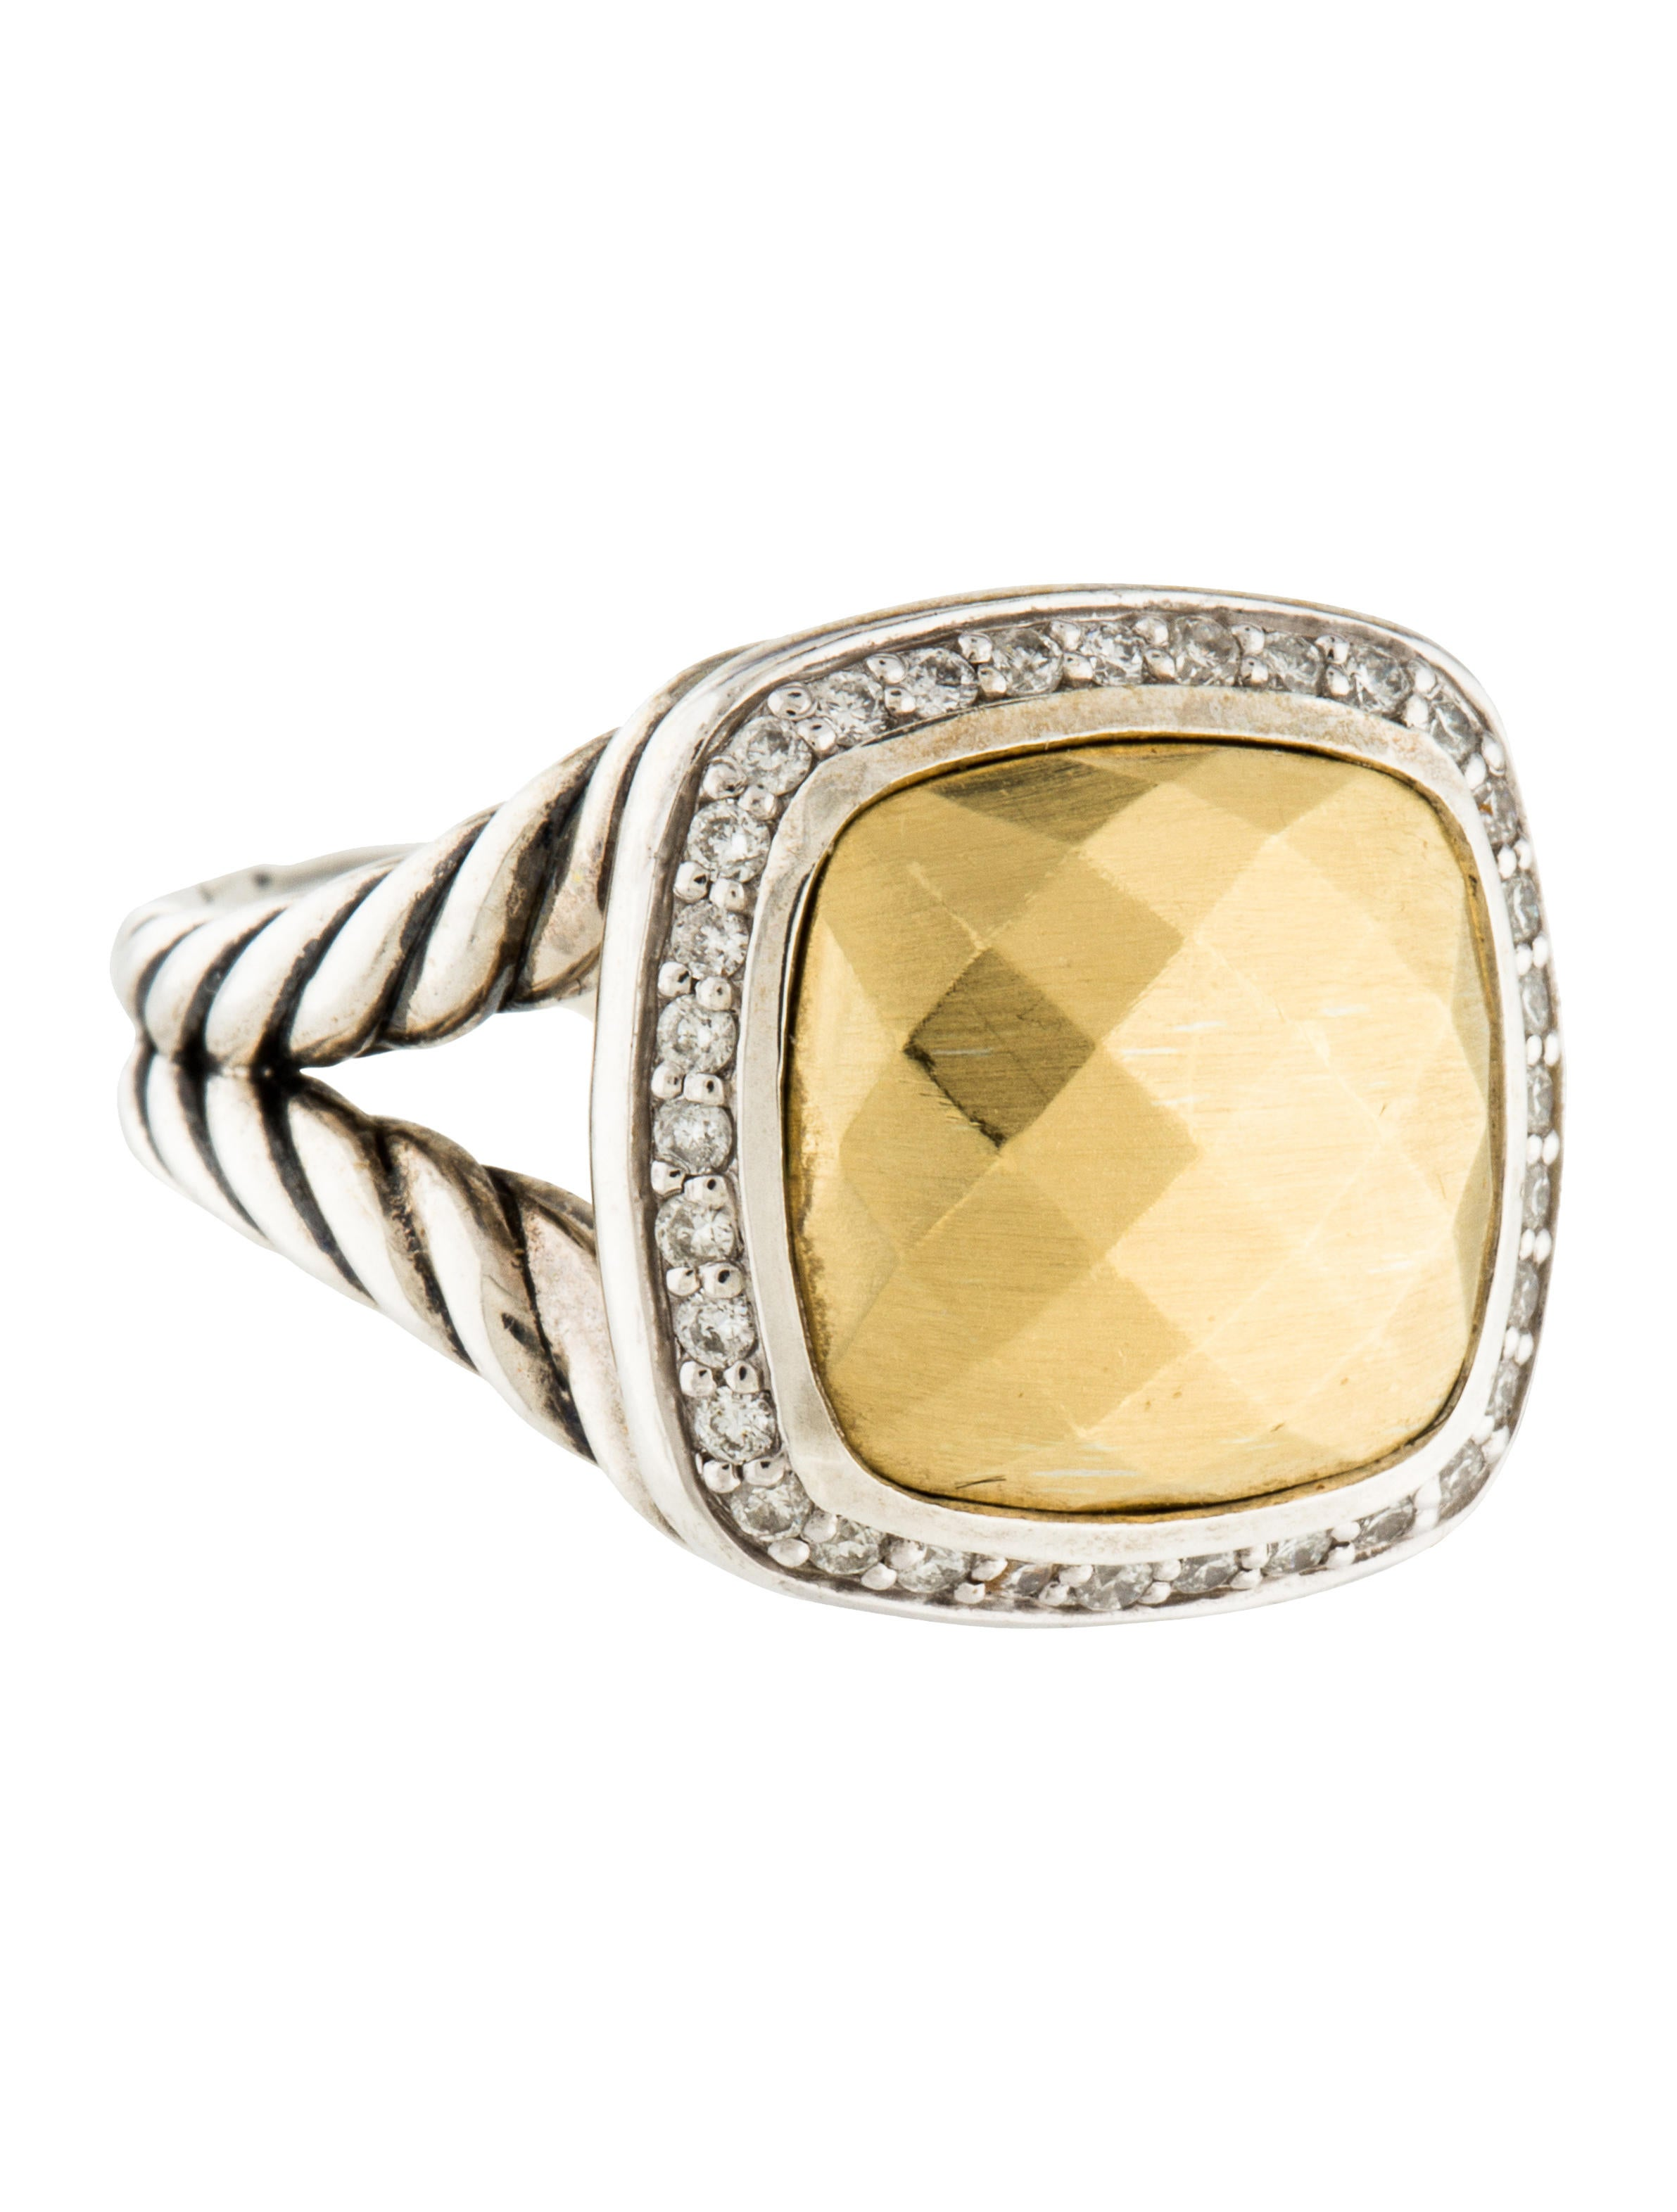 David yurman albion ring rings dvy43792 the realreal for David yurman inspired jewelry rings